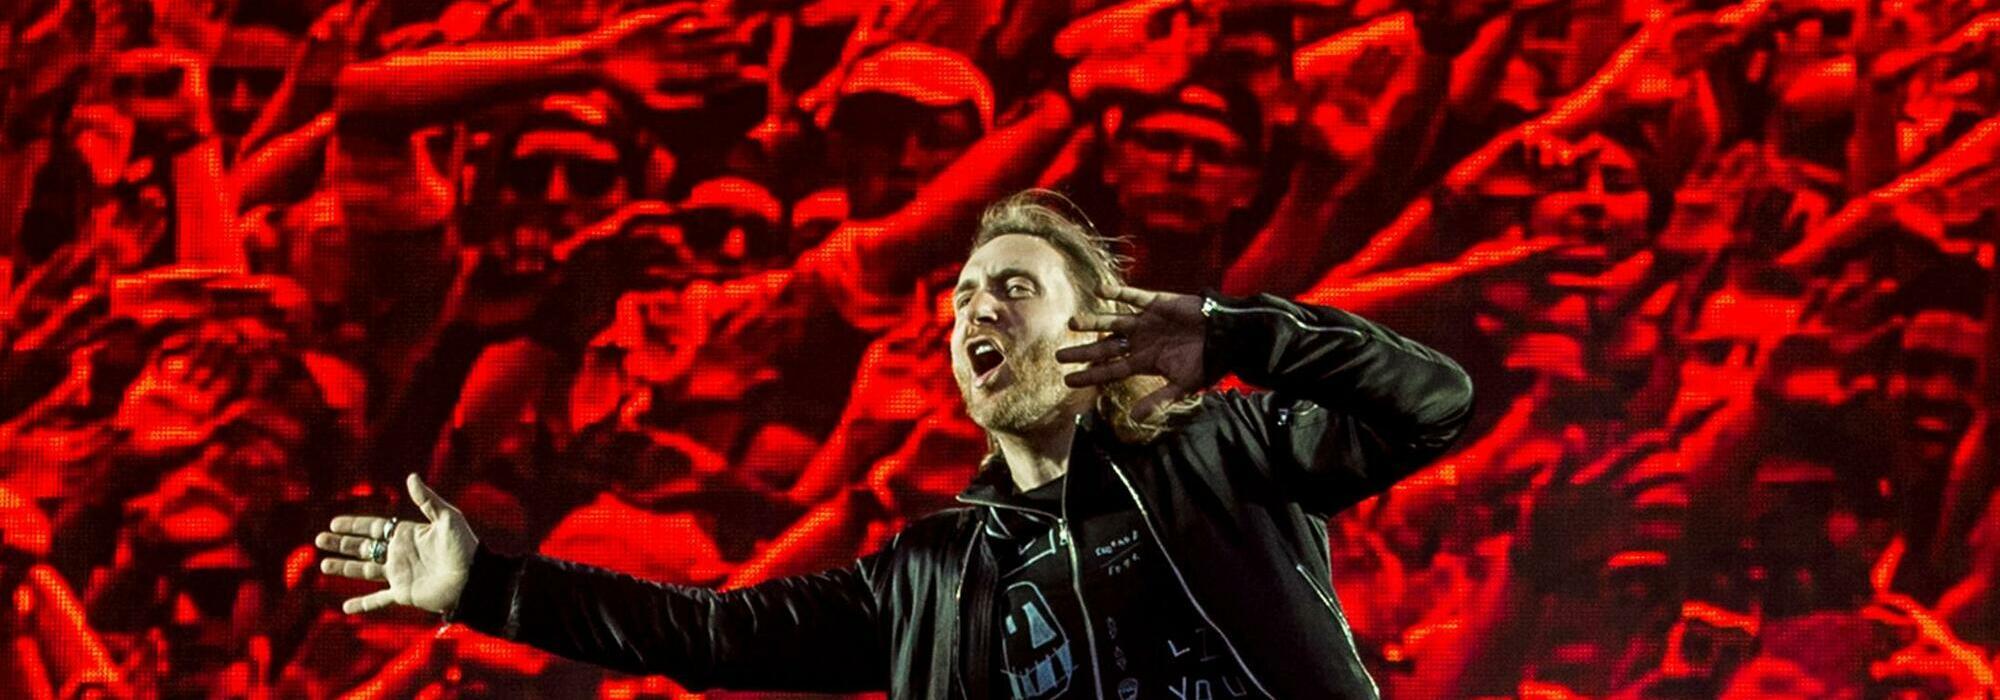 A David Guetta live event